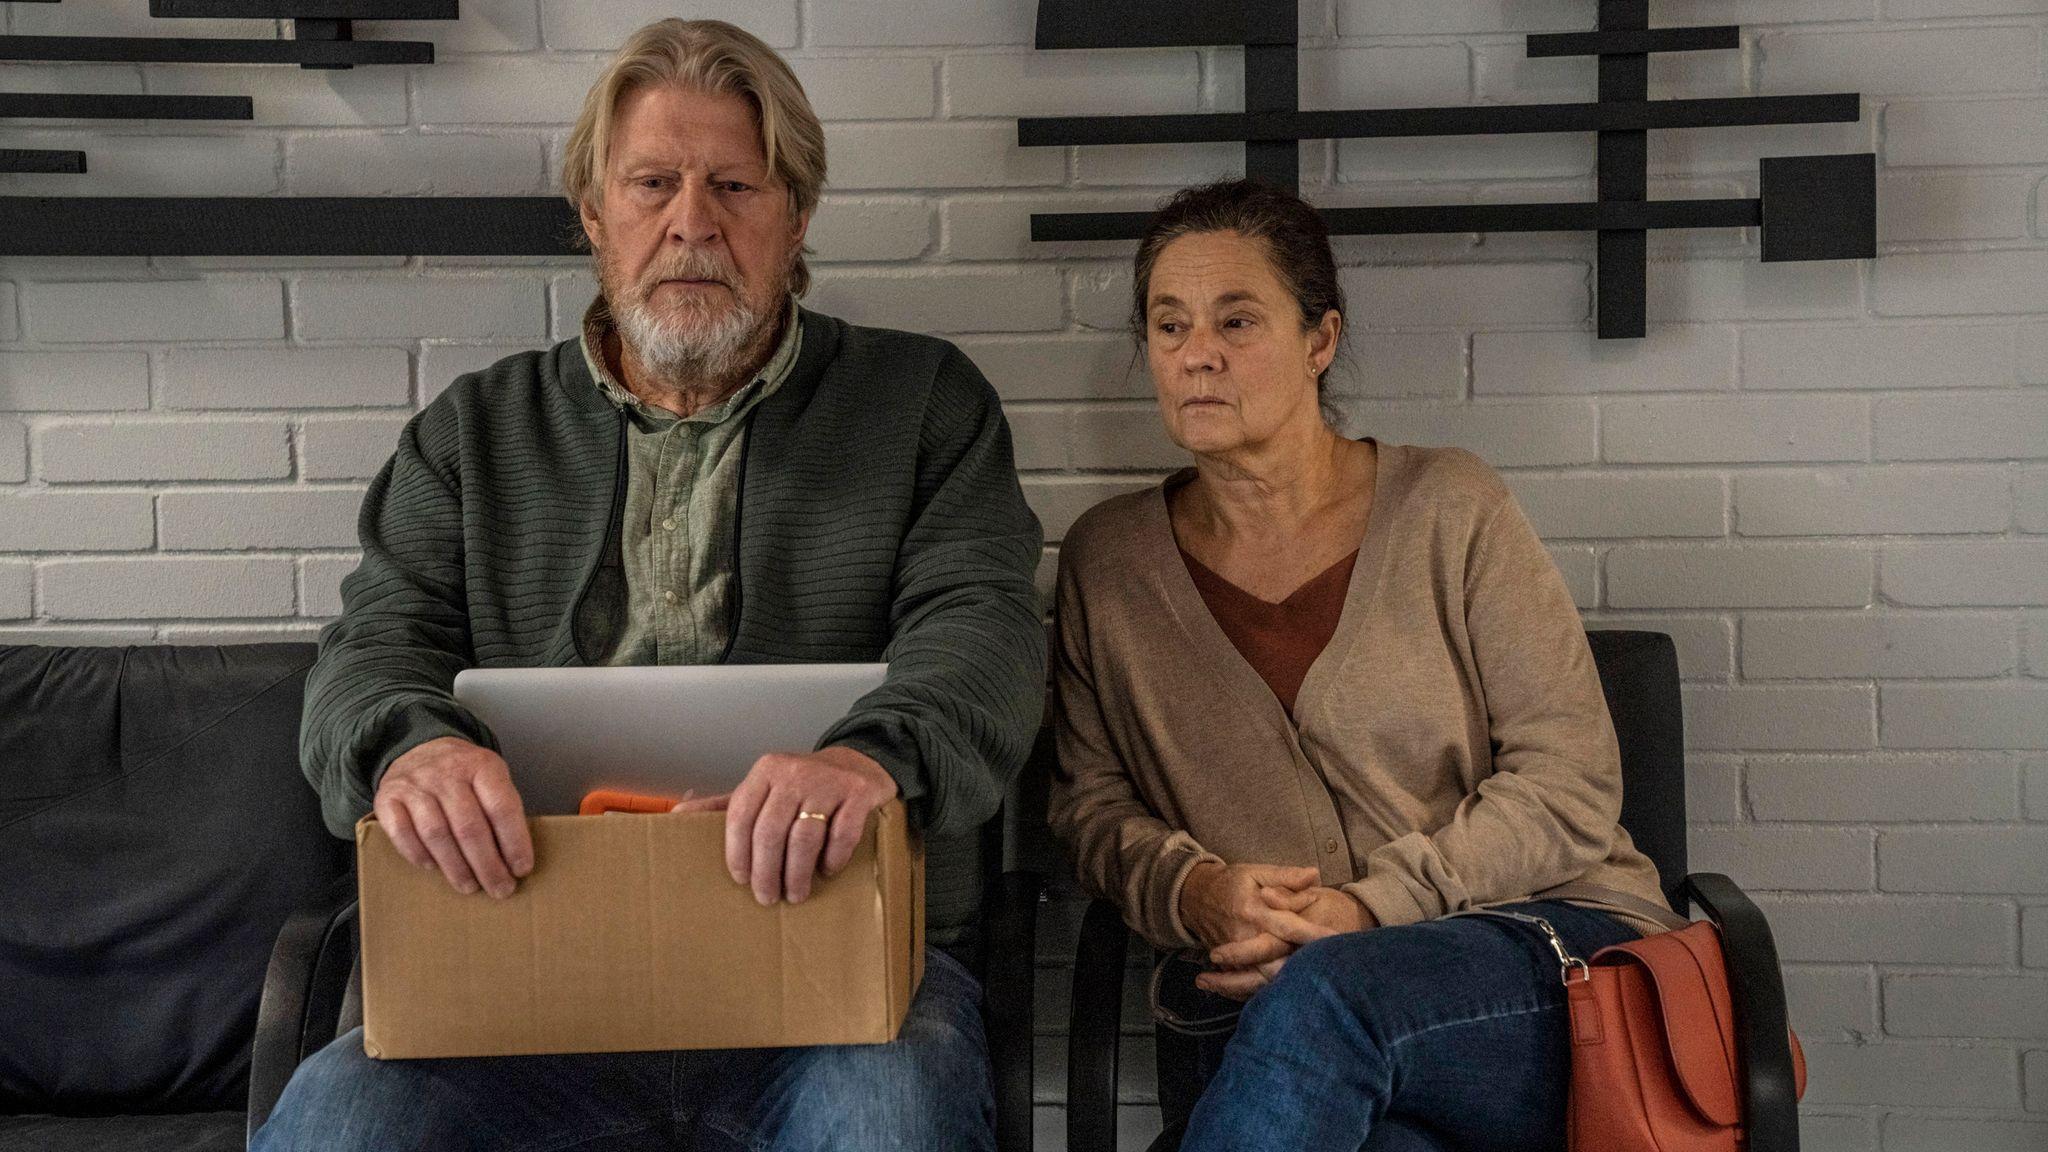 Joachim Wall (ROLF LASSGARD), Ingrid Wall (PERNILLA AUGUST) in The Investigation. Pic: BBC / misofilm & outline film / Per Arnesen